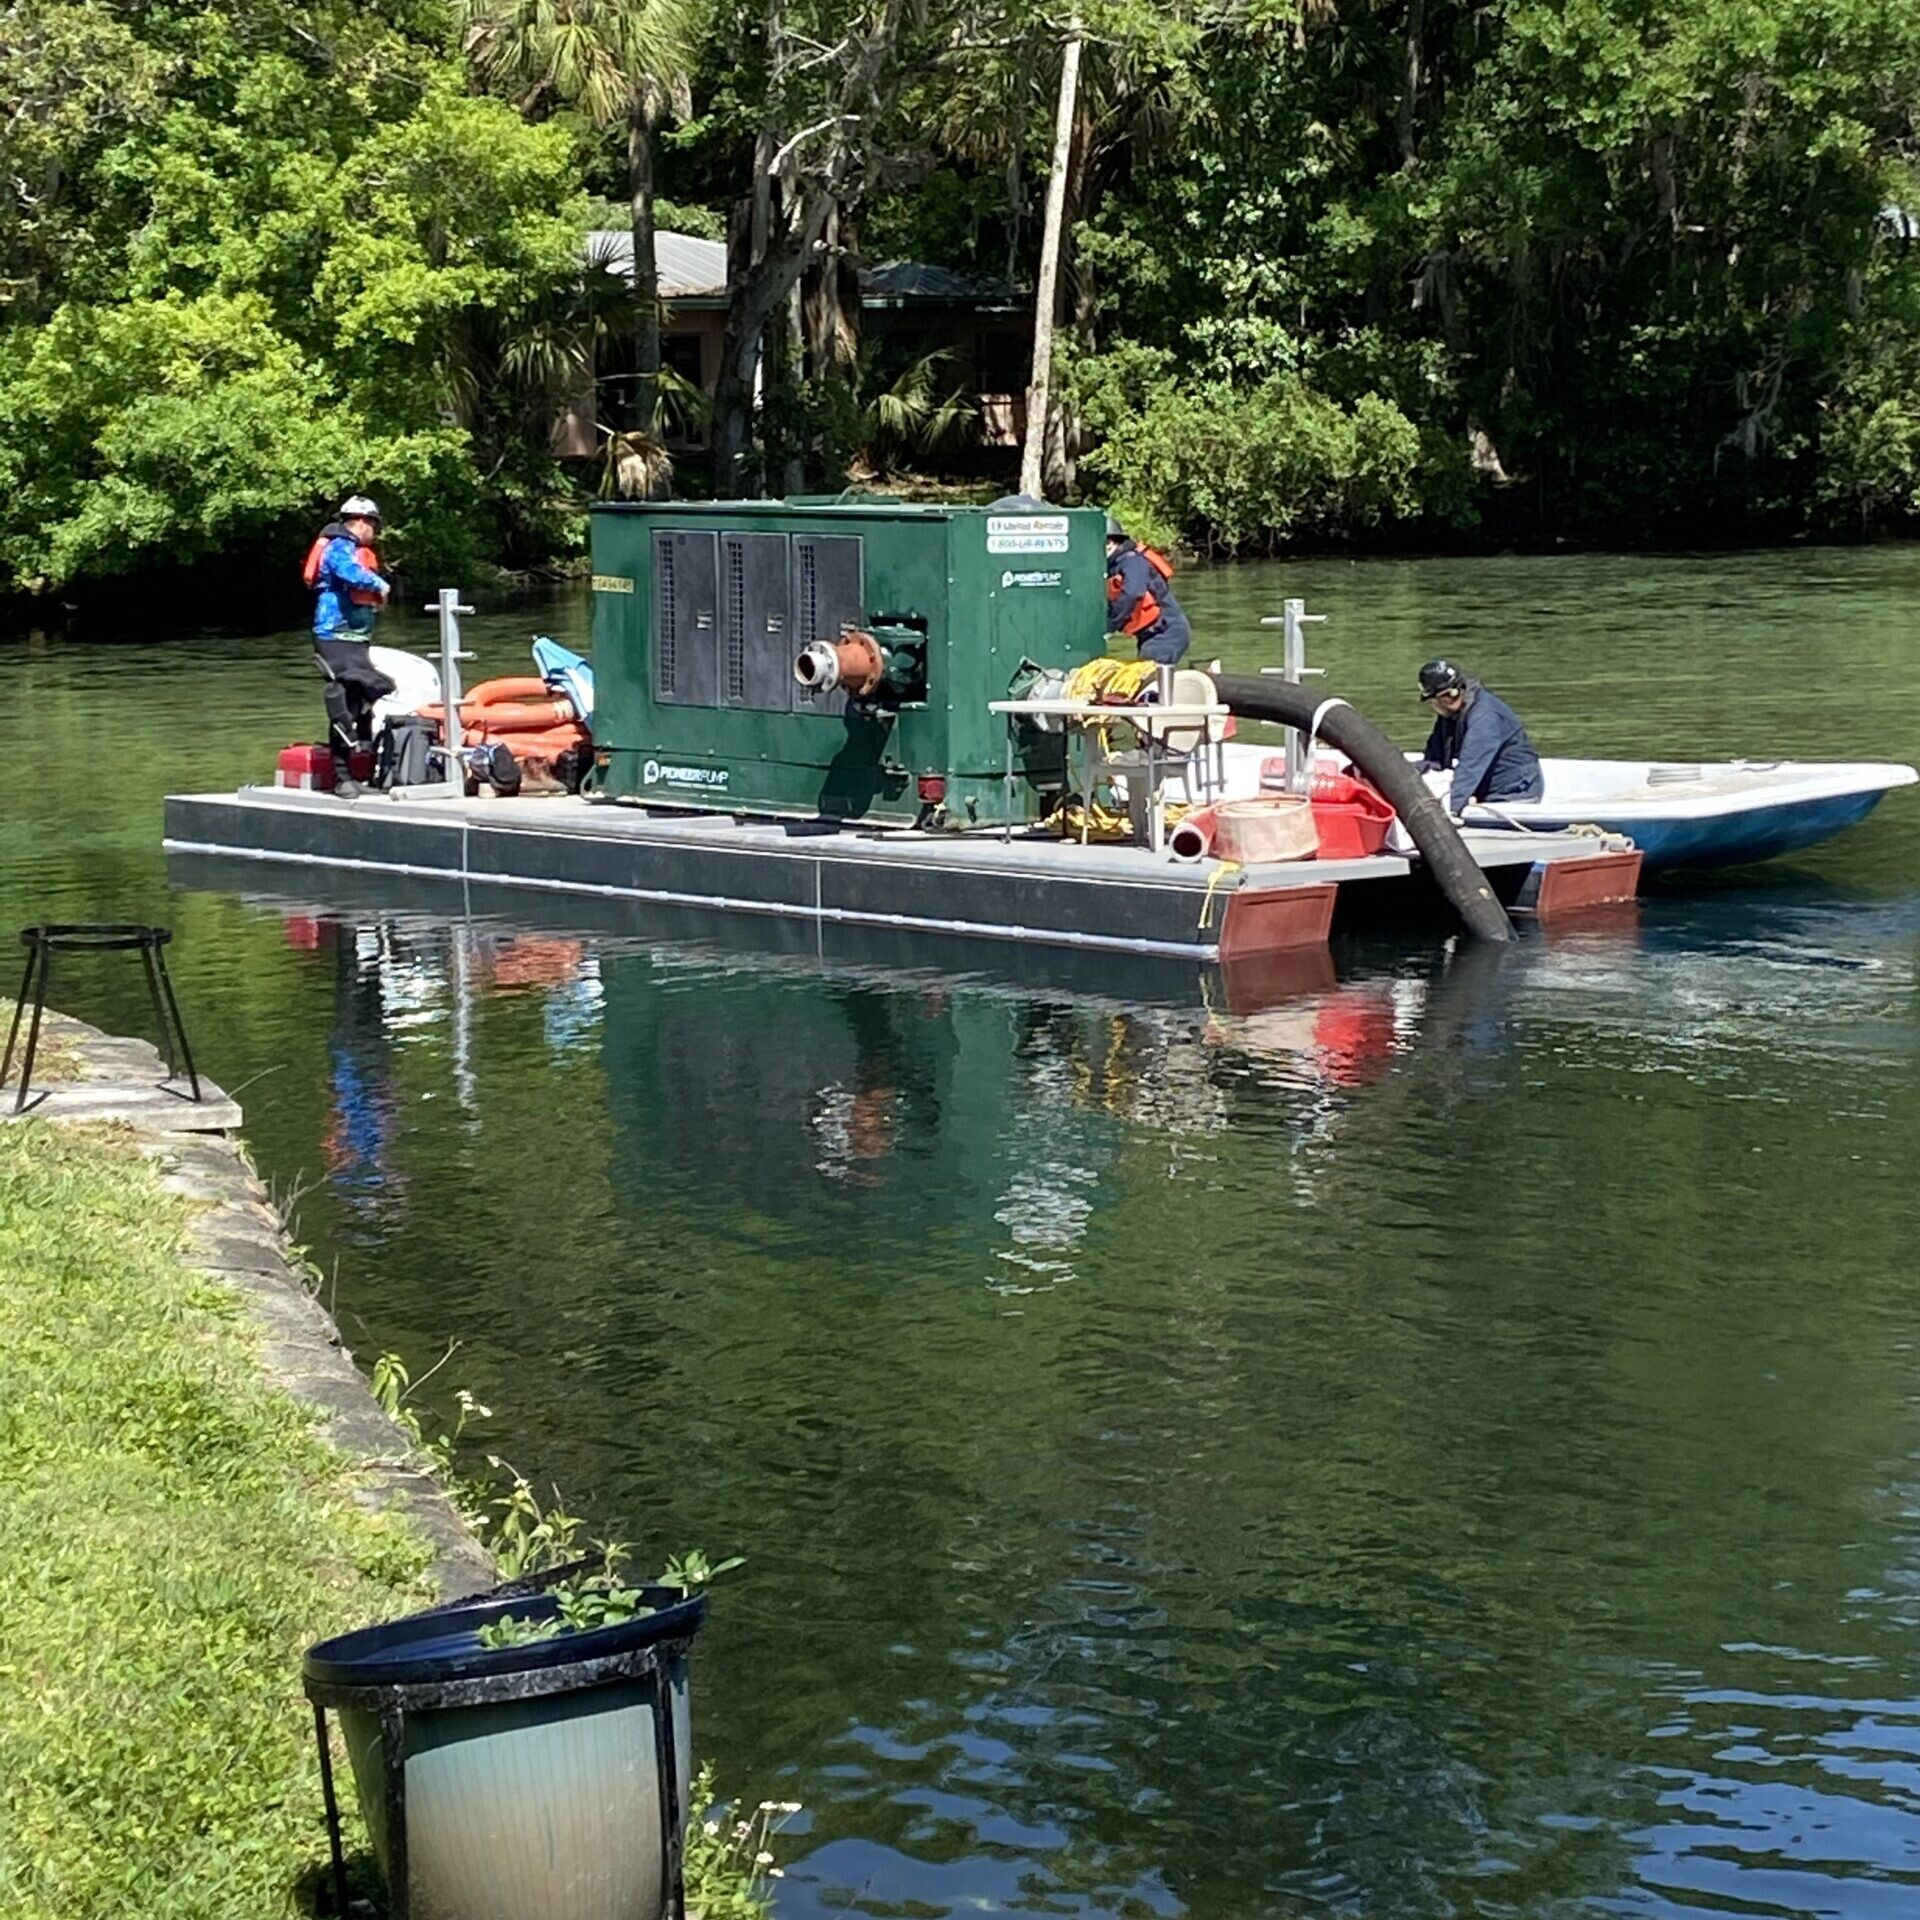 barge, divers, pump